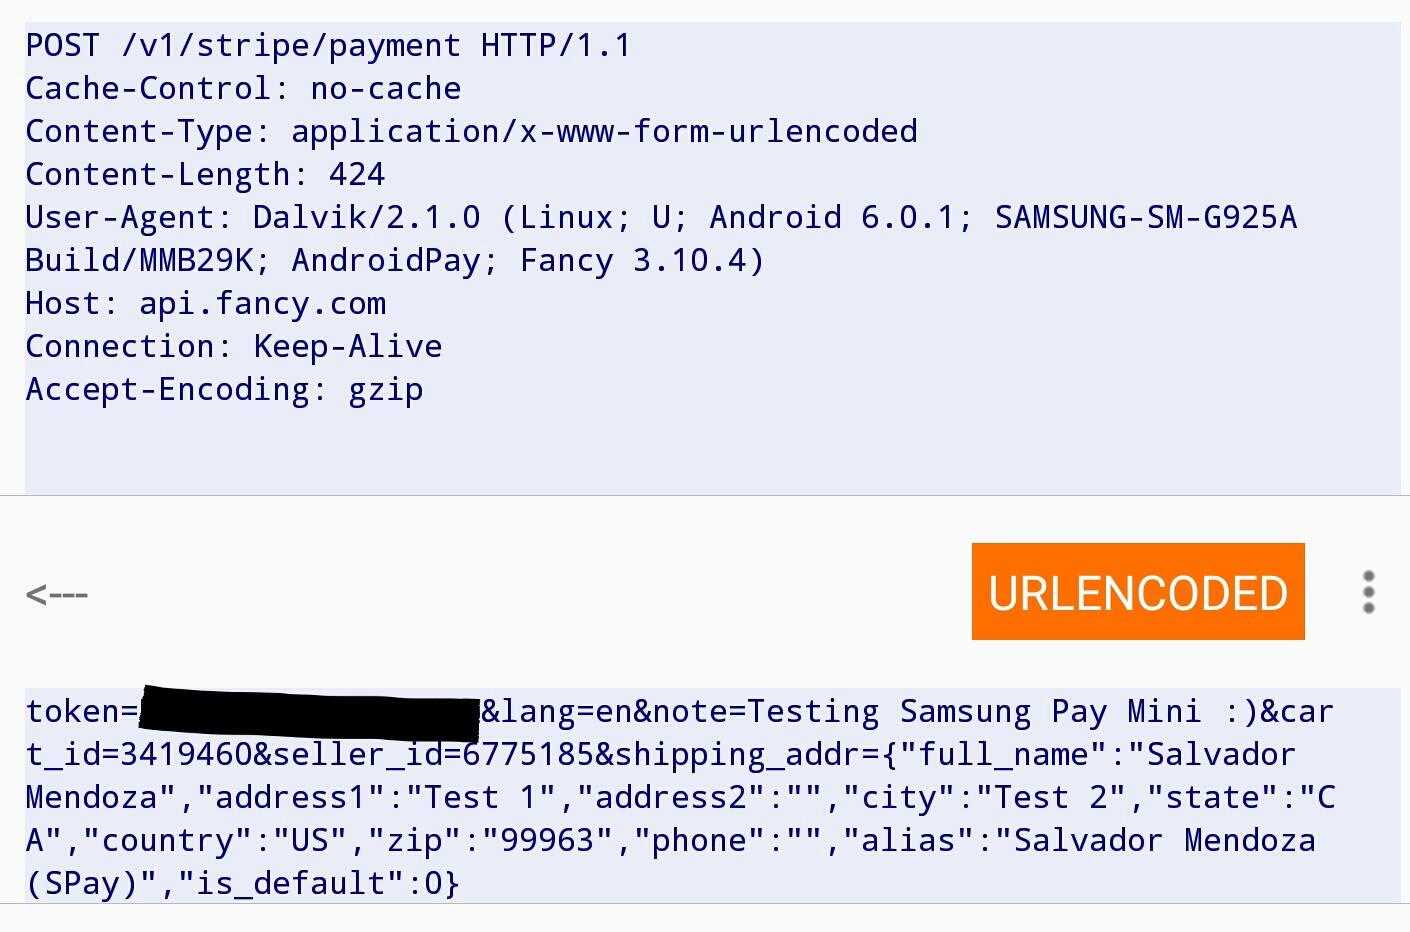 Samsung Pay Mini – Salvador Mendoza